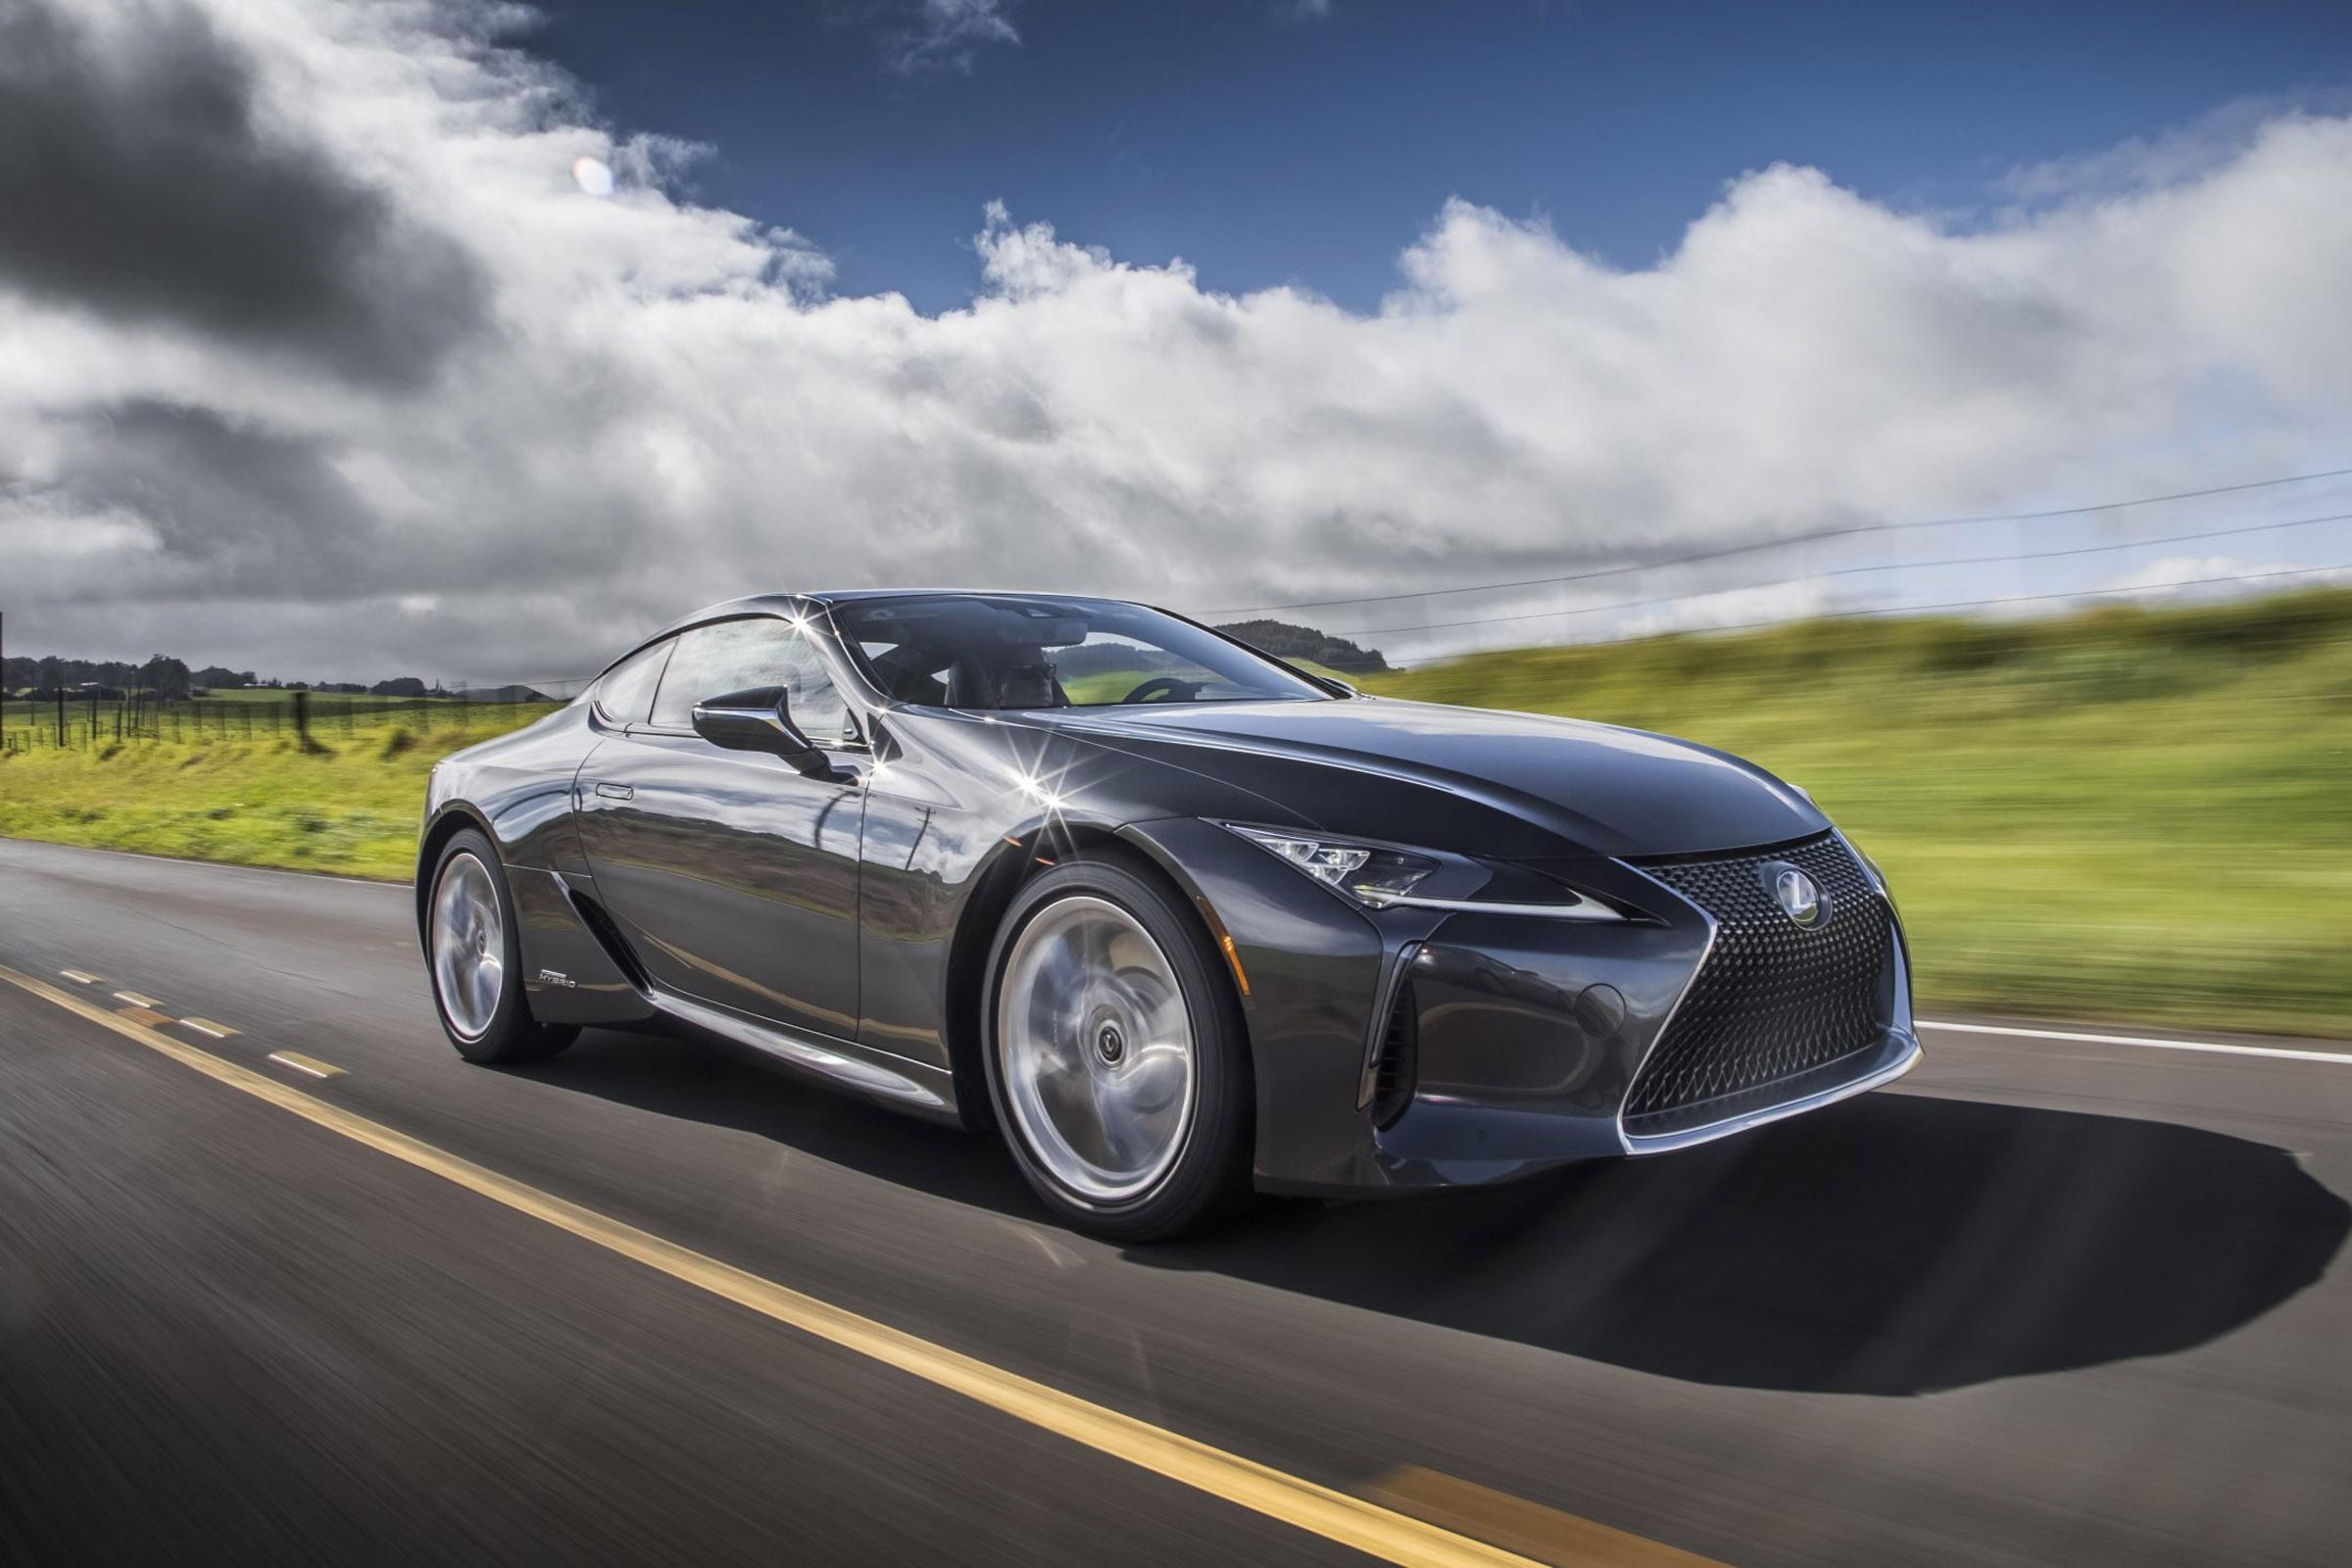 Best-looking cars | Carbuyer